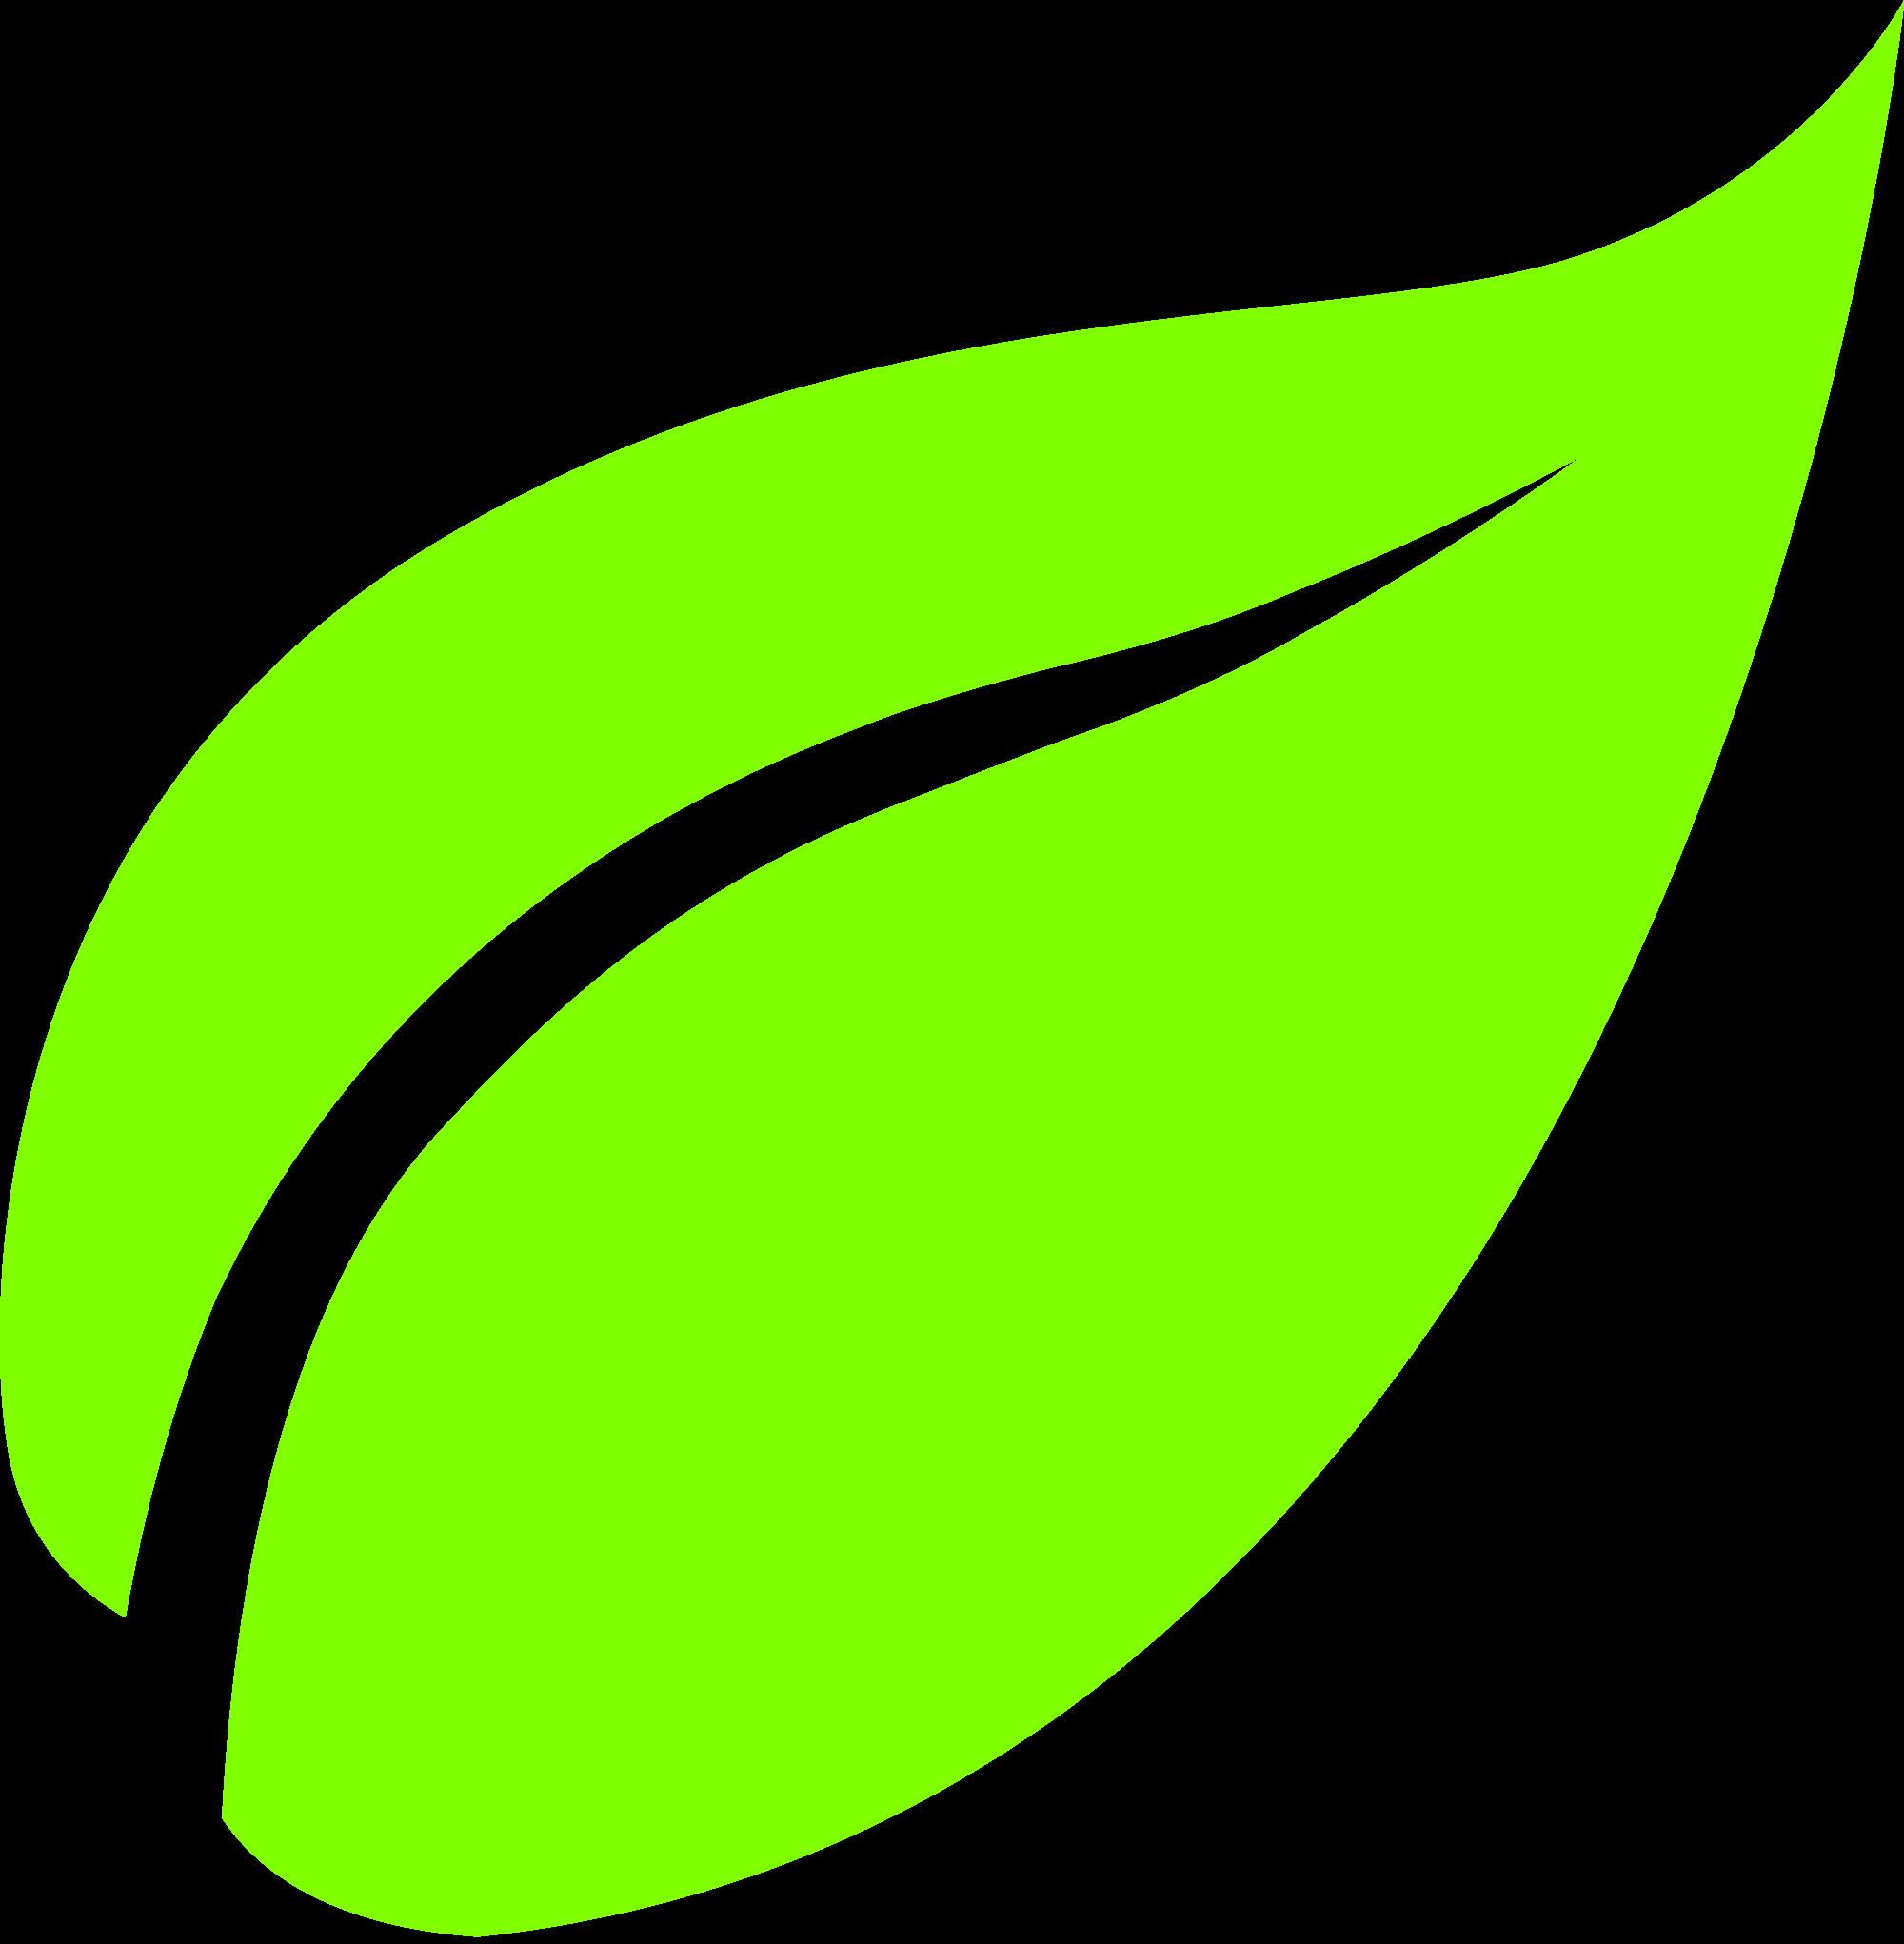 Leaf vector png. Icon clipart transparentpng